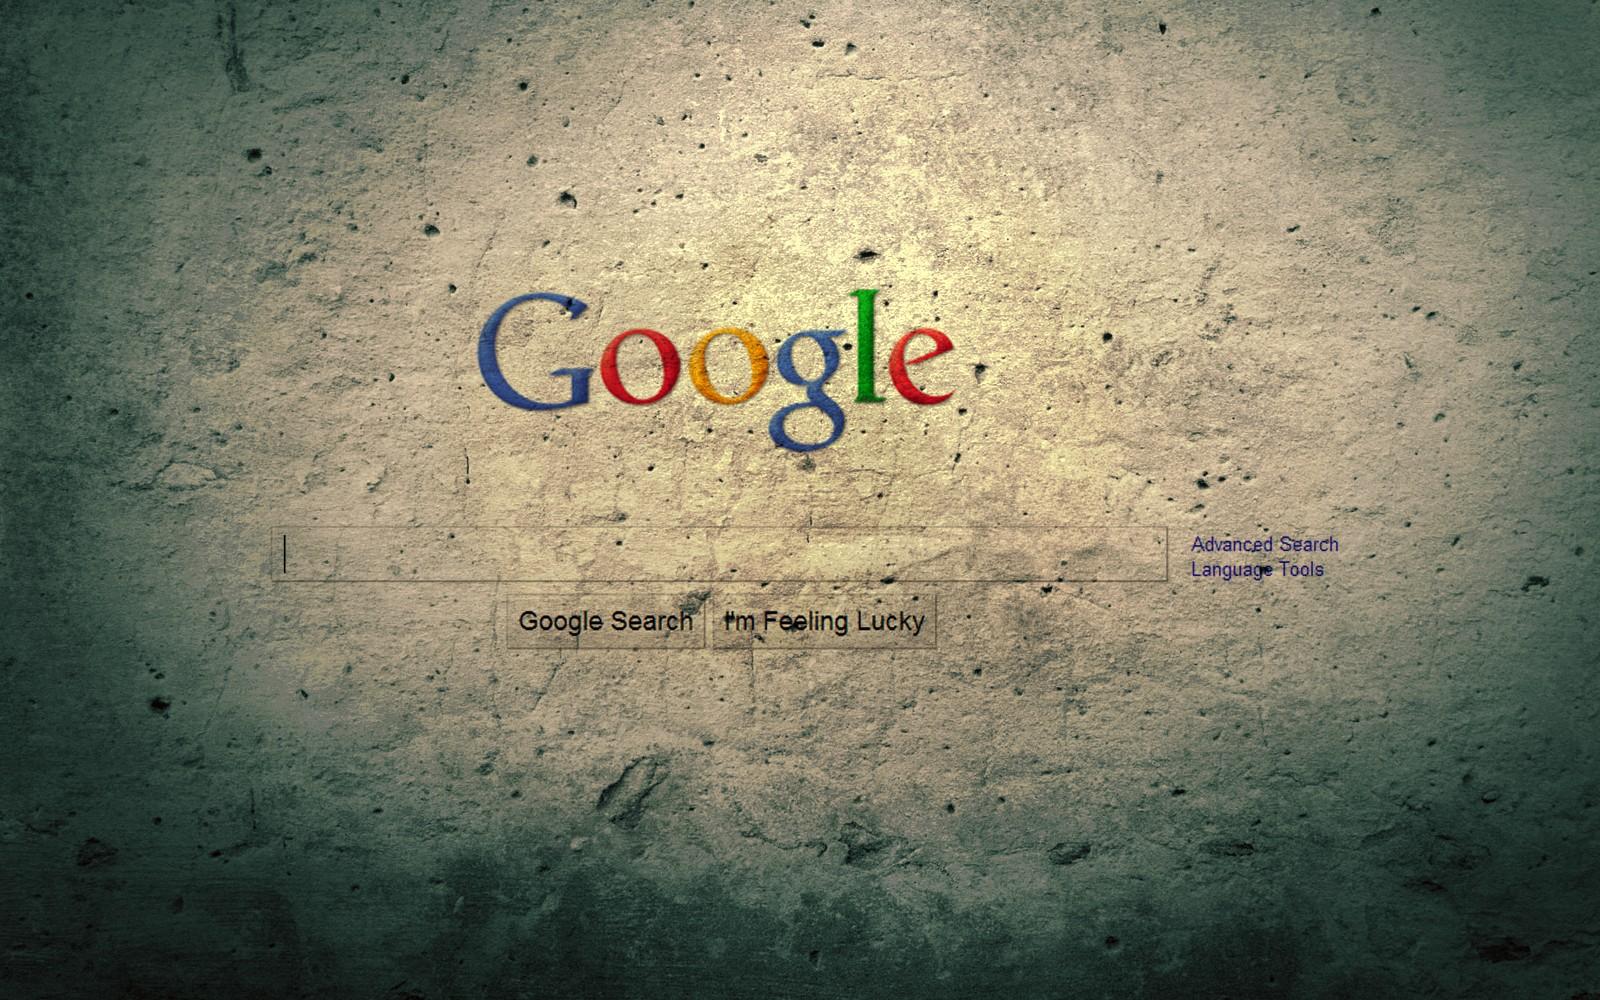 Google Old Wallpaper 1600x1000 Google Old School DNDESIGN 1600x1000